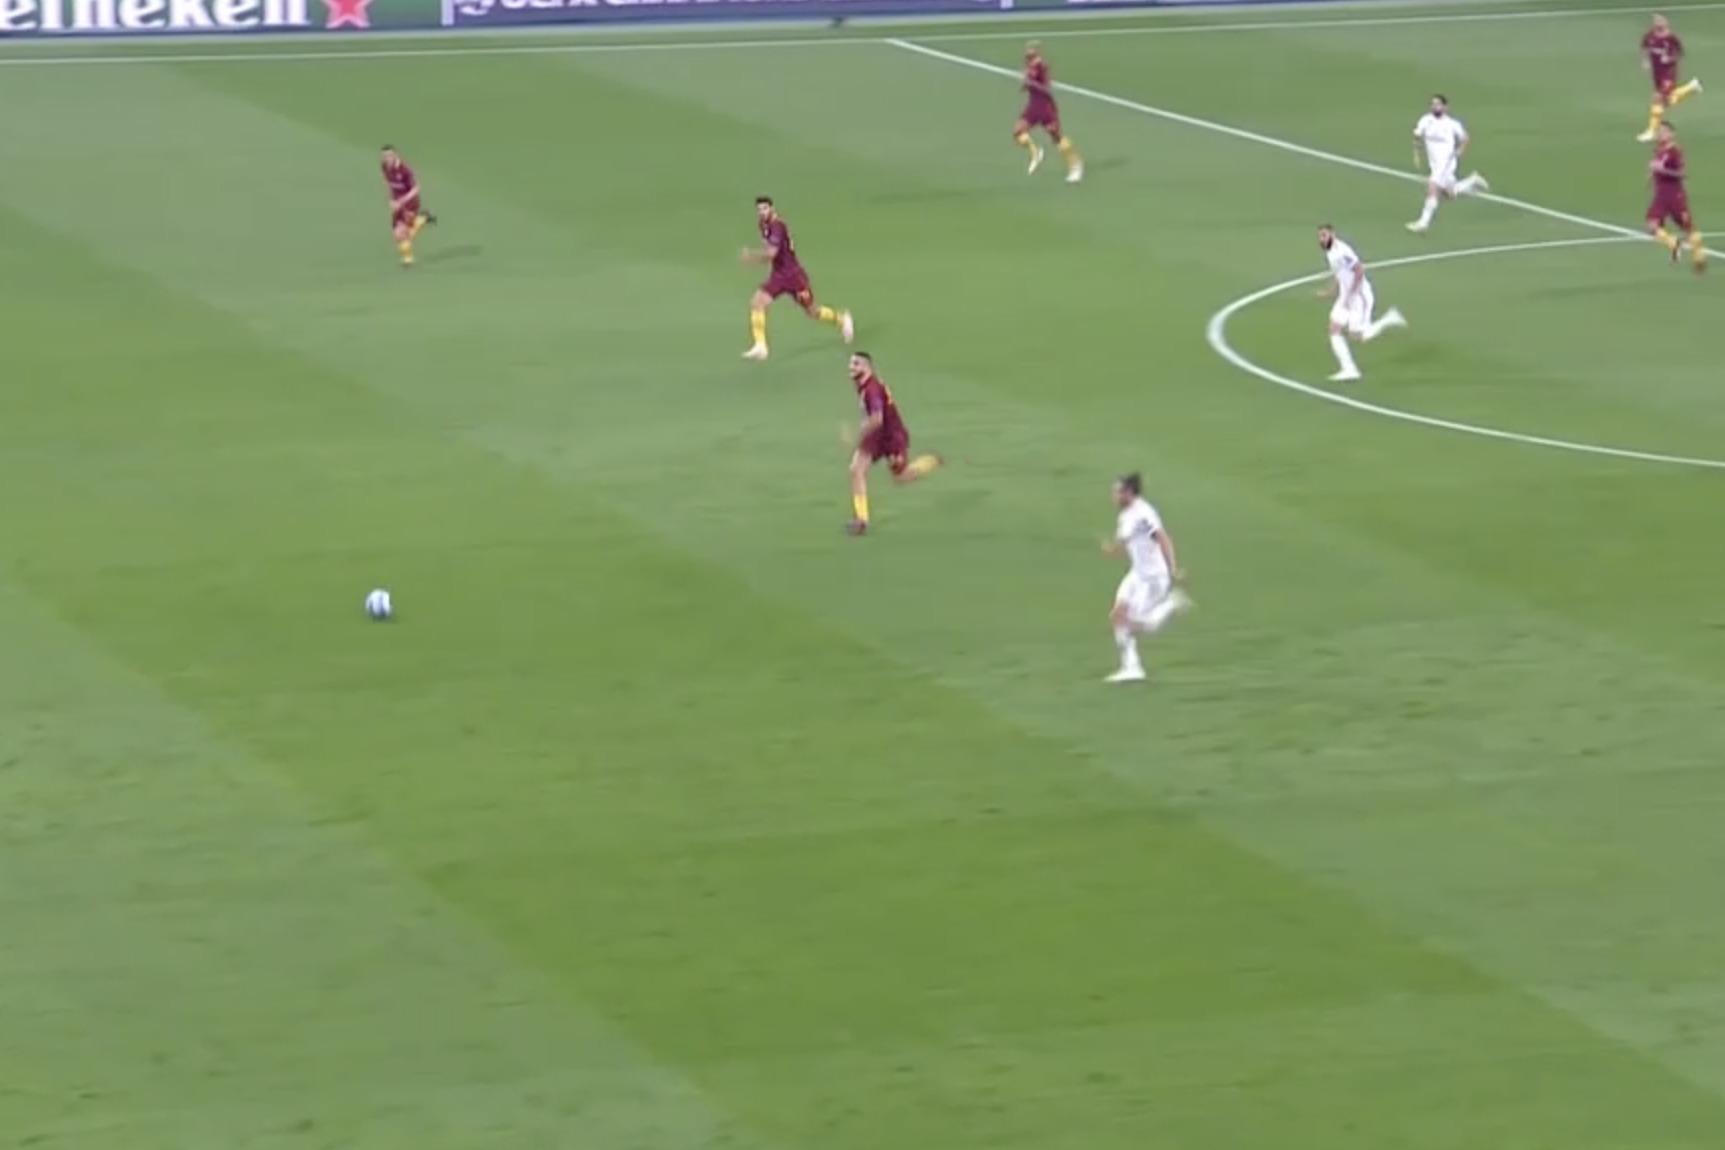 FC Bayern Munich | Bleacher Report | Latest News, Scores, Stats and